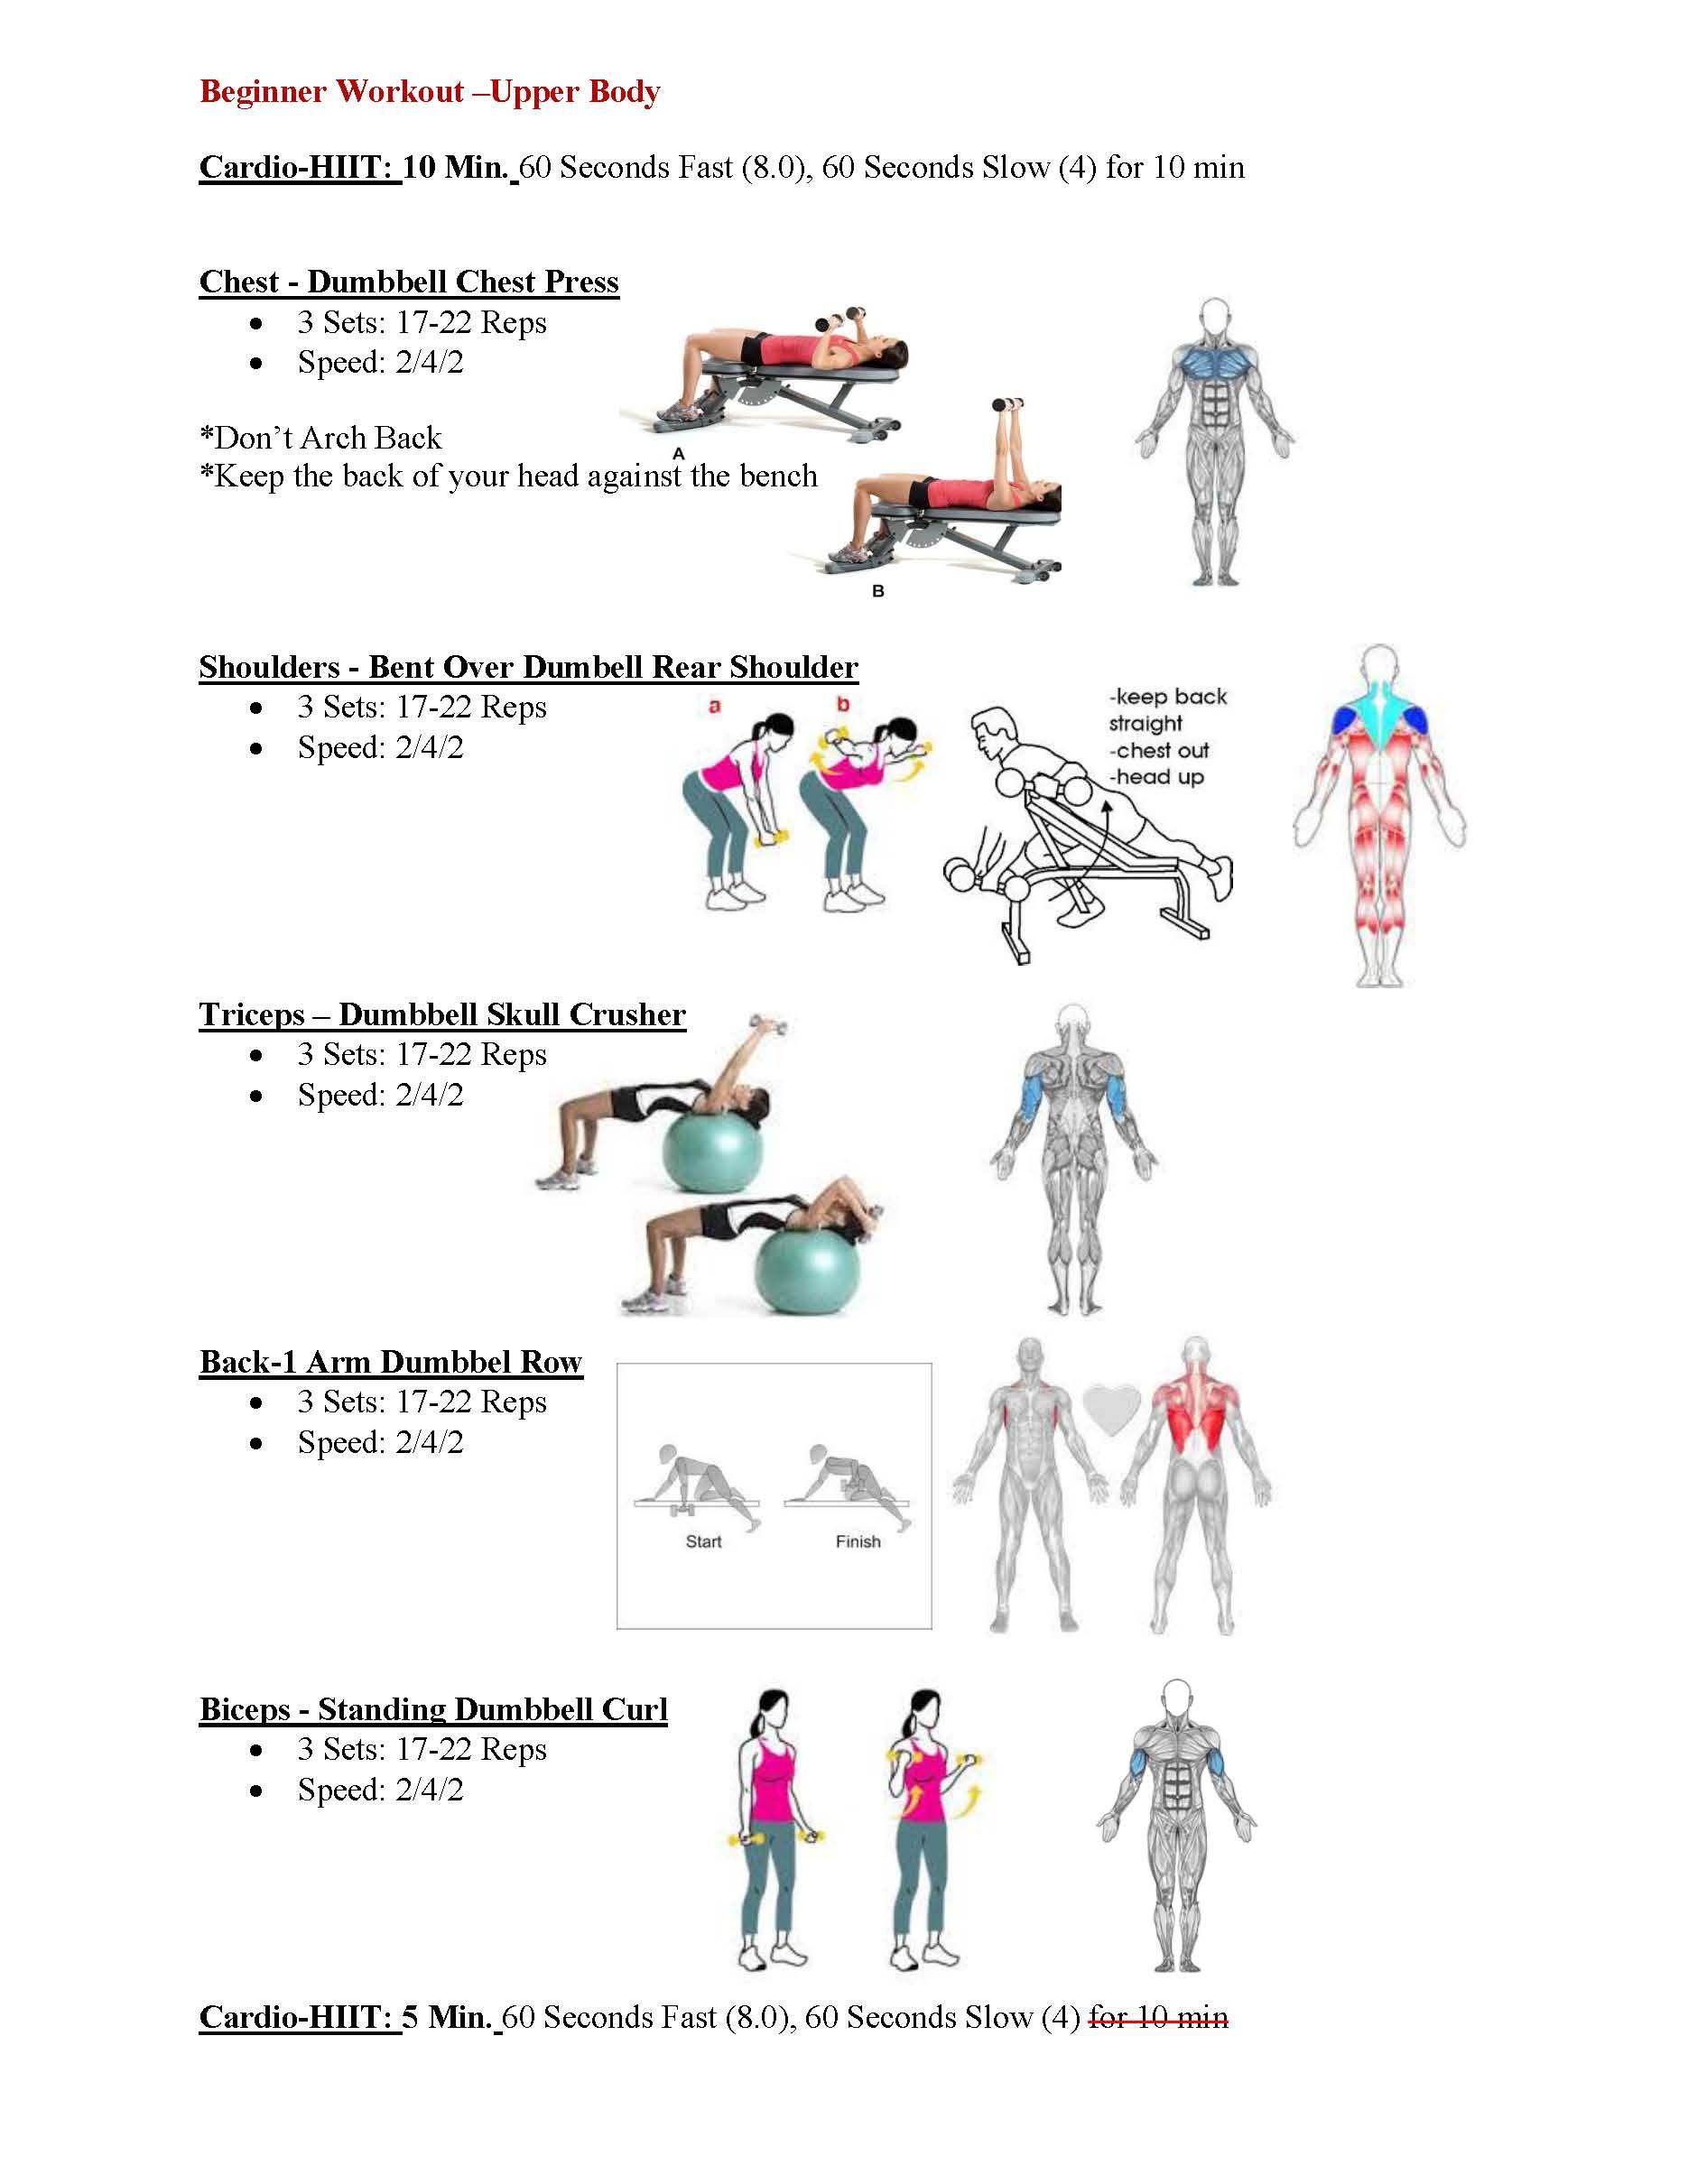 Pin By Vanessa Hansen On Fitness Beginner Upper Body Workout Upper Body Workout Routine Upper Body Workout